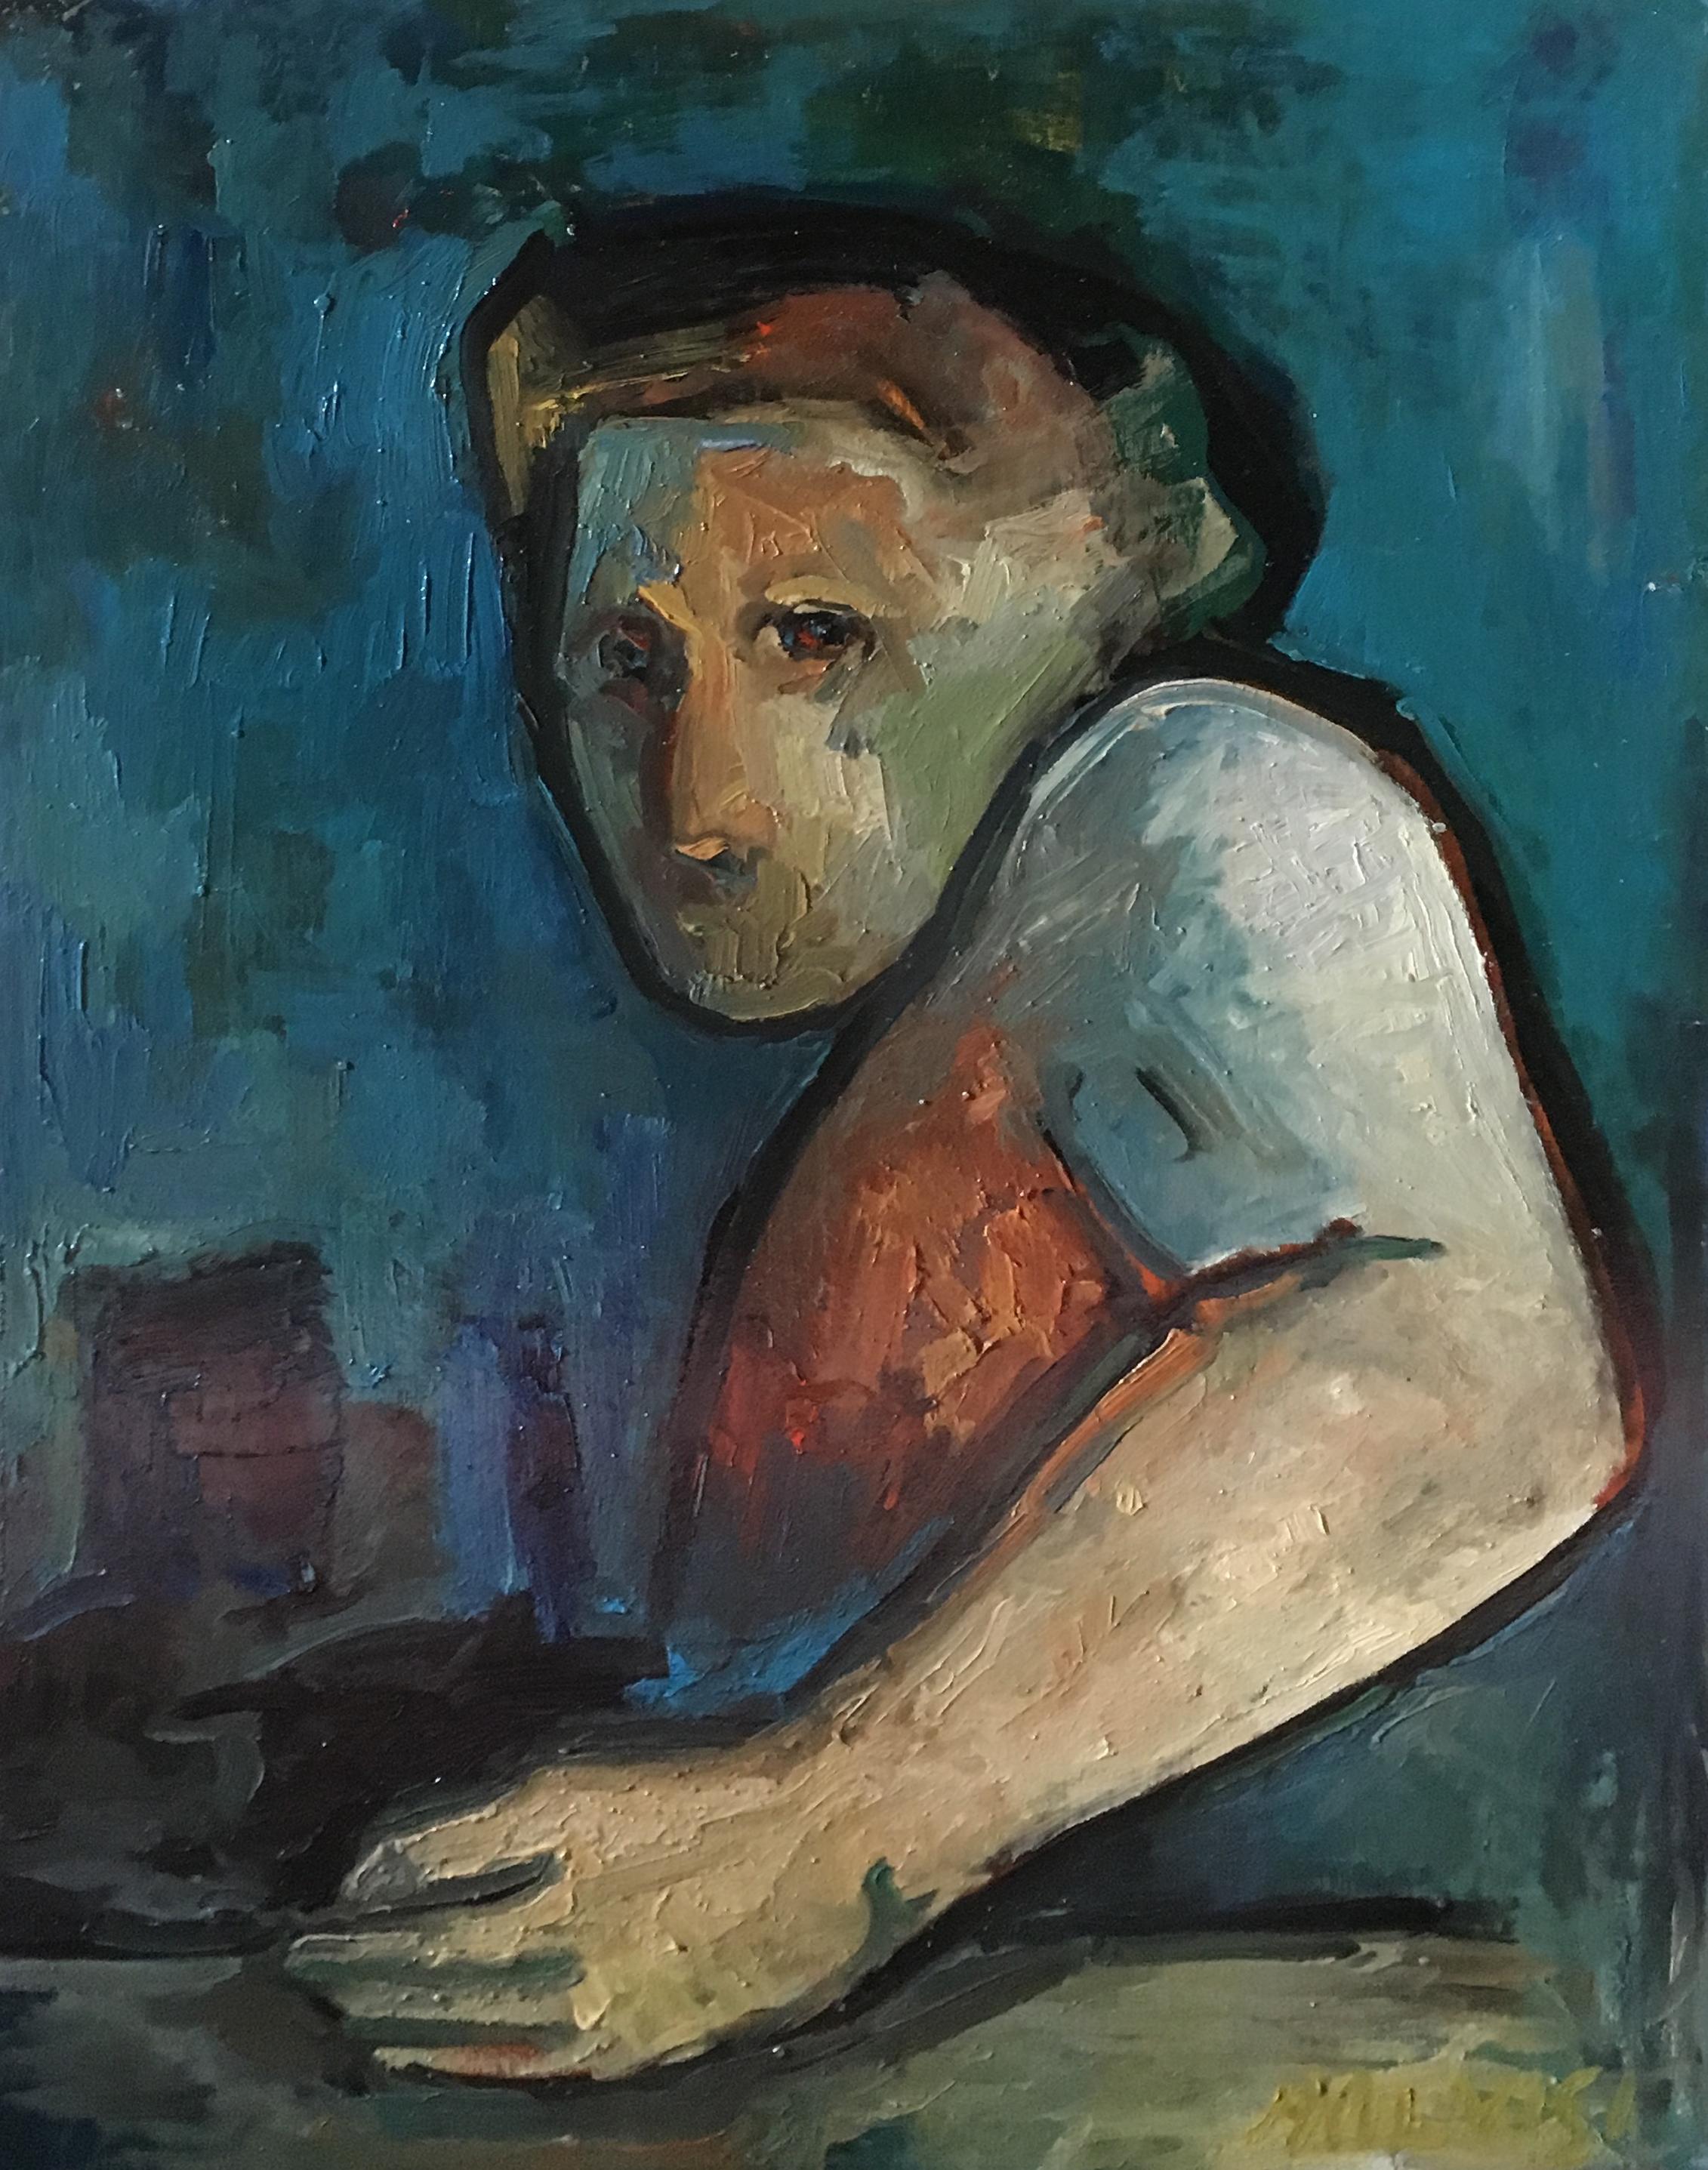 <b>Bust of man</b><br> (Orig.Busto d'uomo) <br> 2003 Oil on wood <br> cm 50 x 70